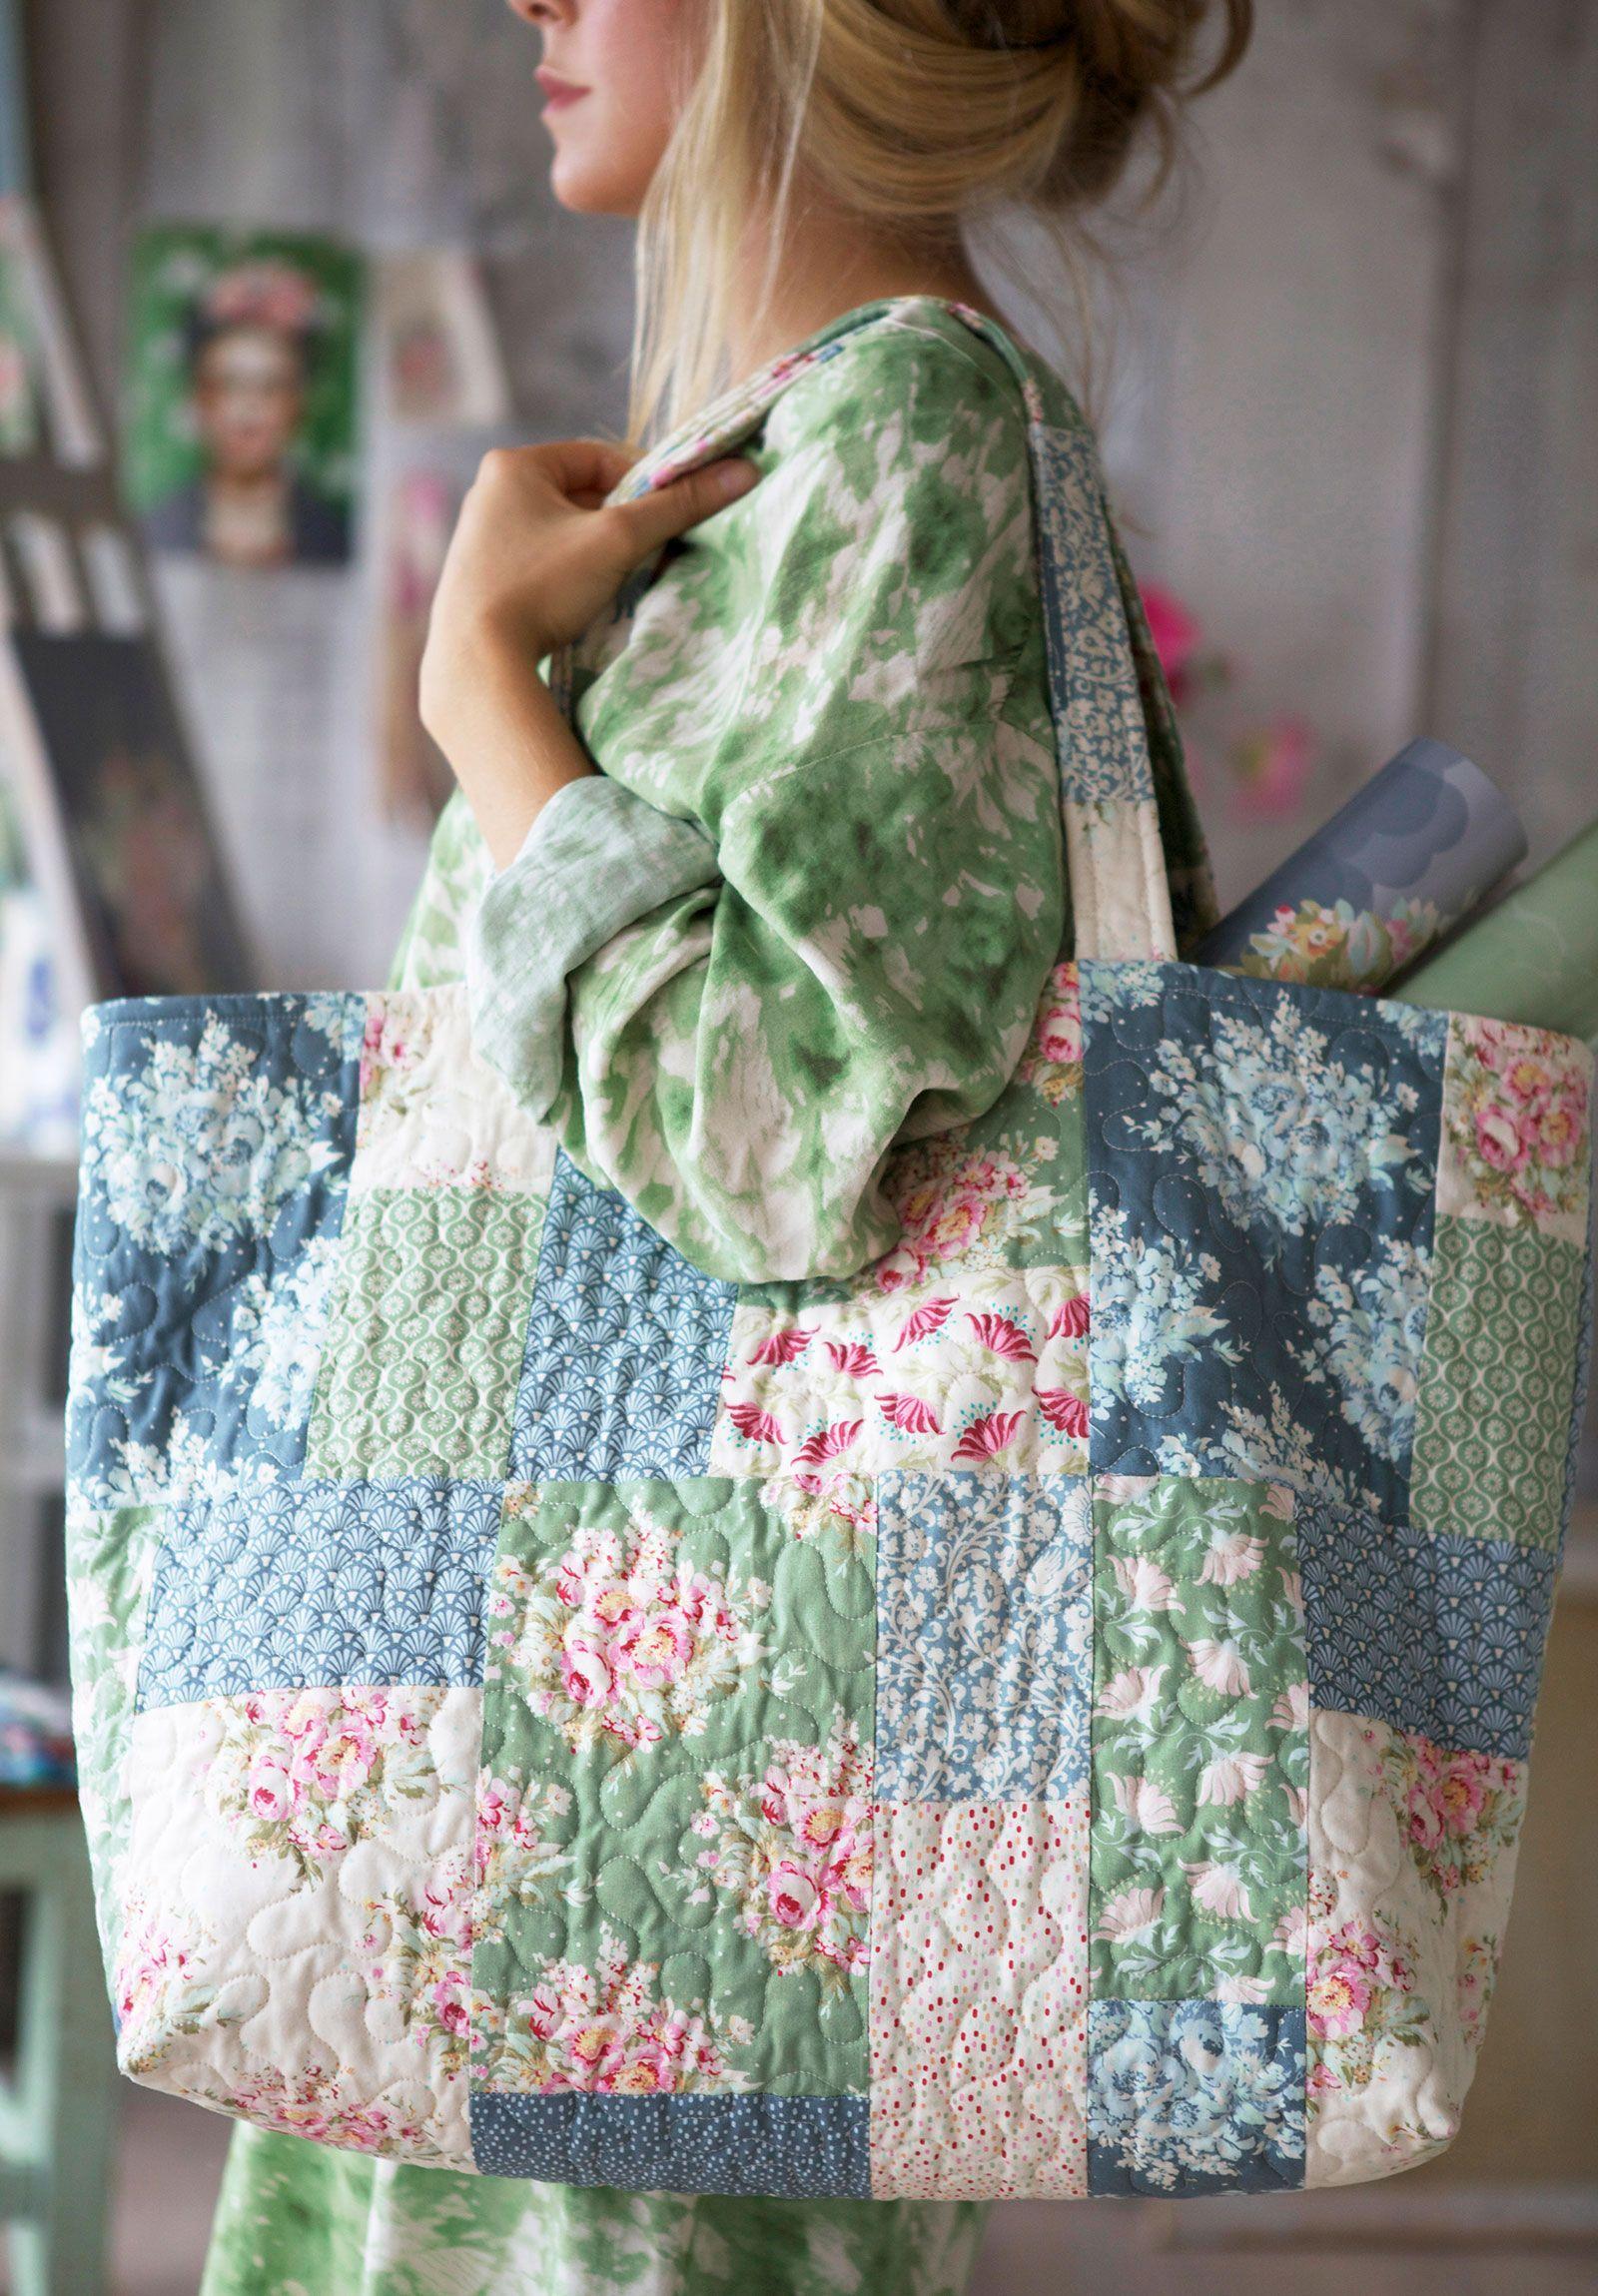 malerei blumen tasche sewing bags patchwork bags und. Black Bedroom Furniture Sets. Home Design Ideas